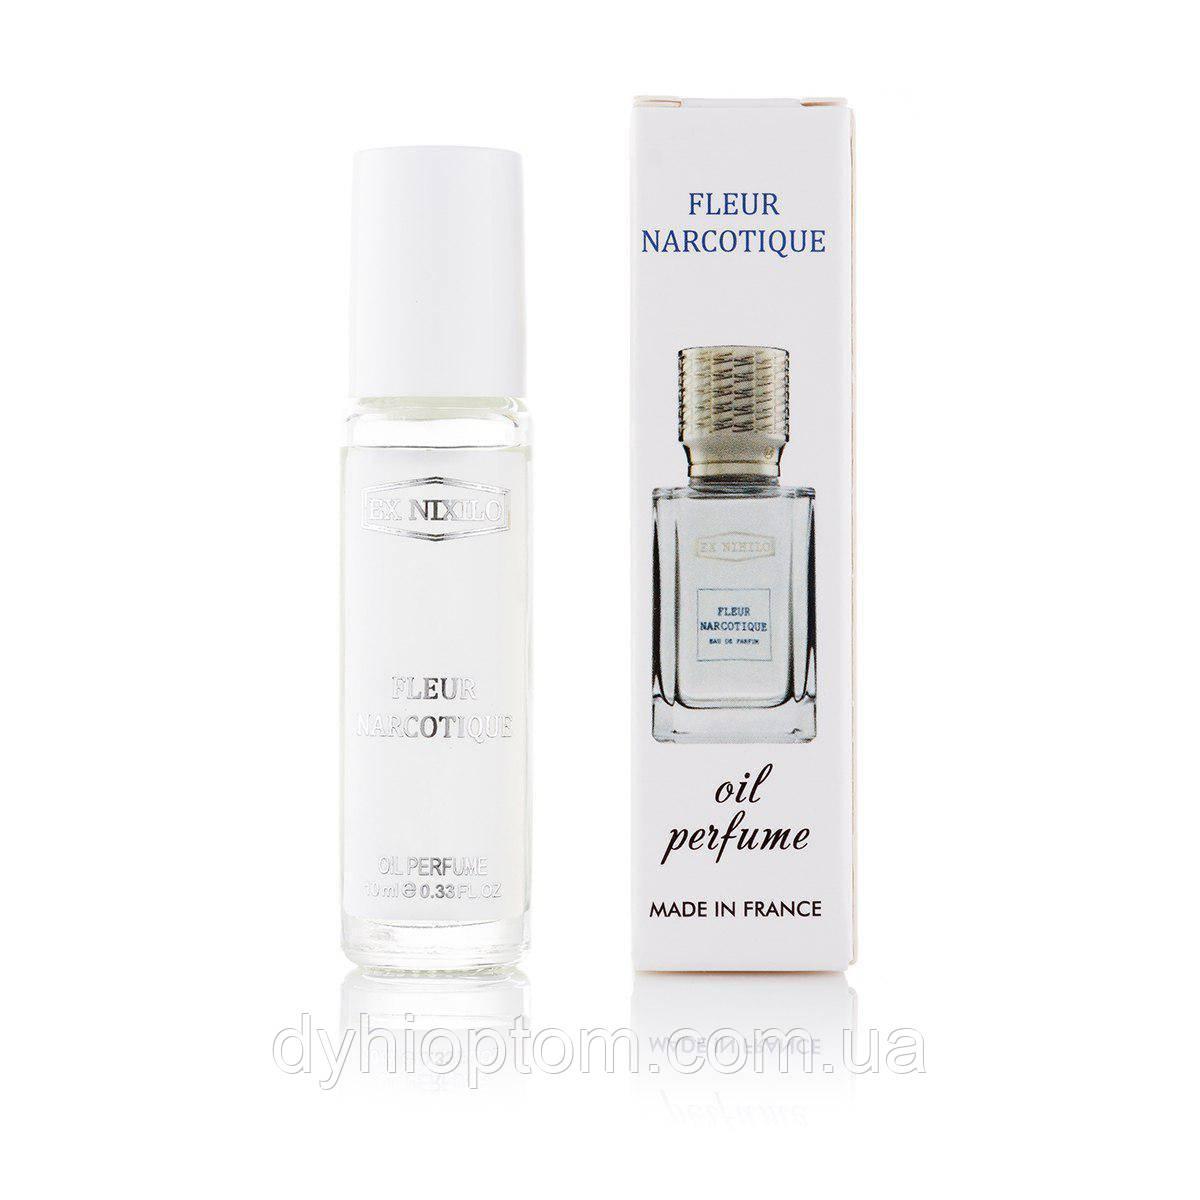 Олійні кулькові парфуми 10мл Ex Nihilo Fleur Narcotique унісекс